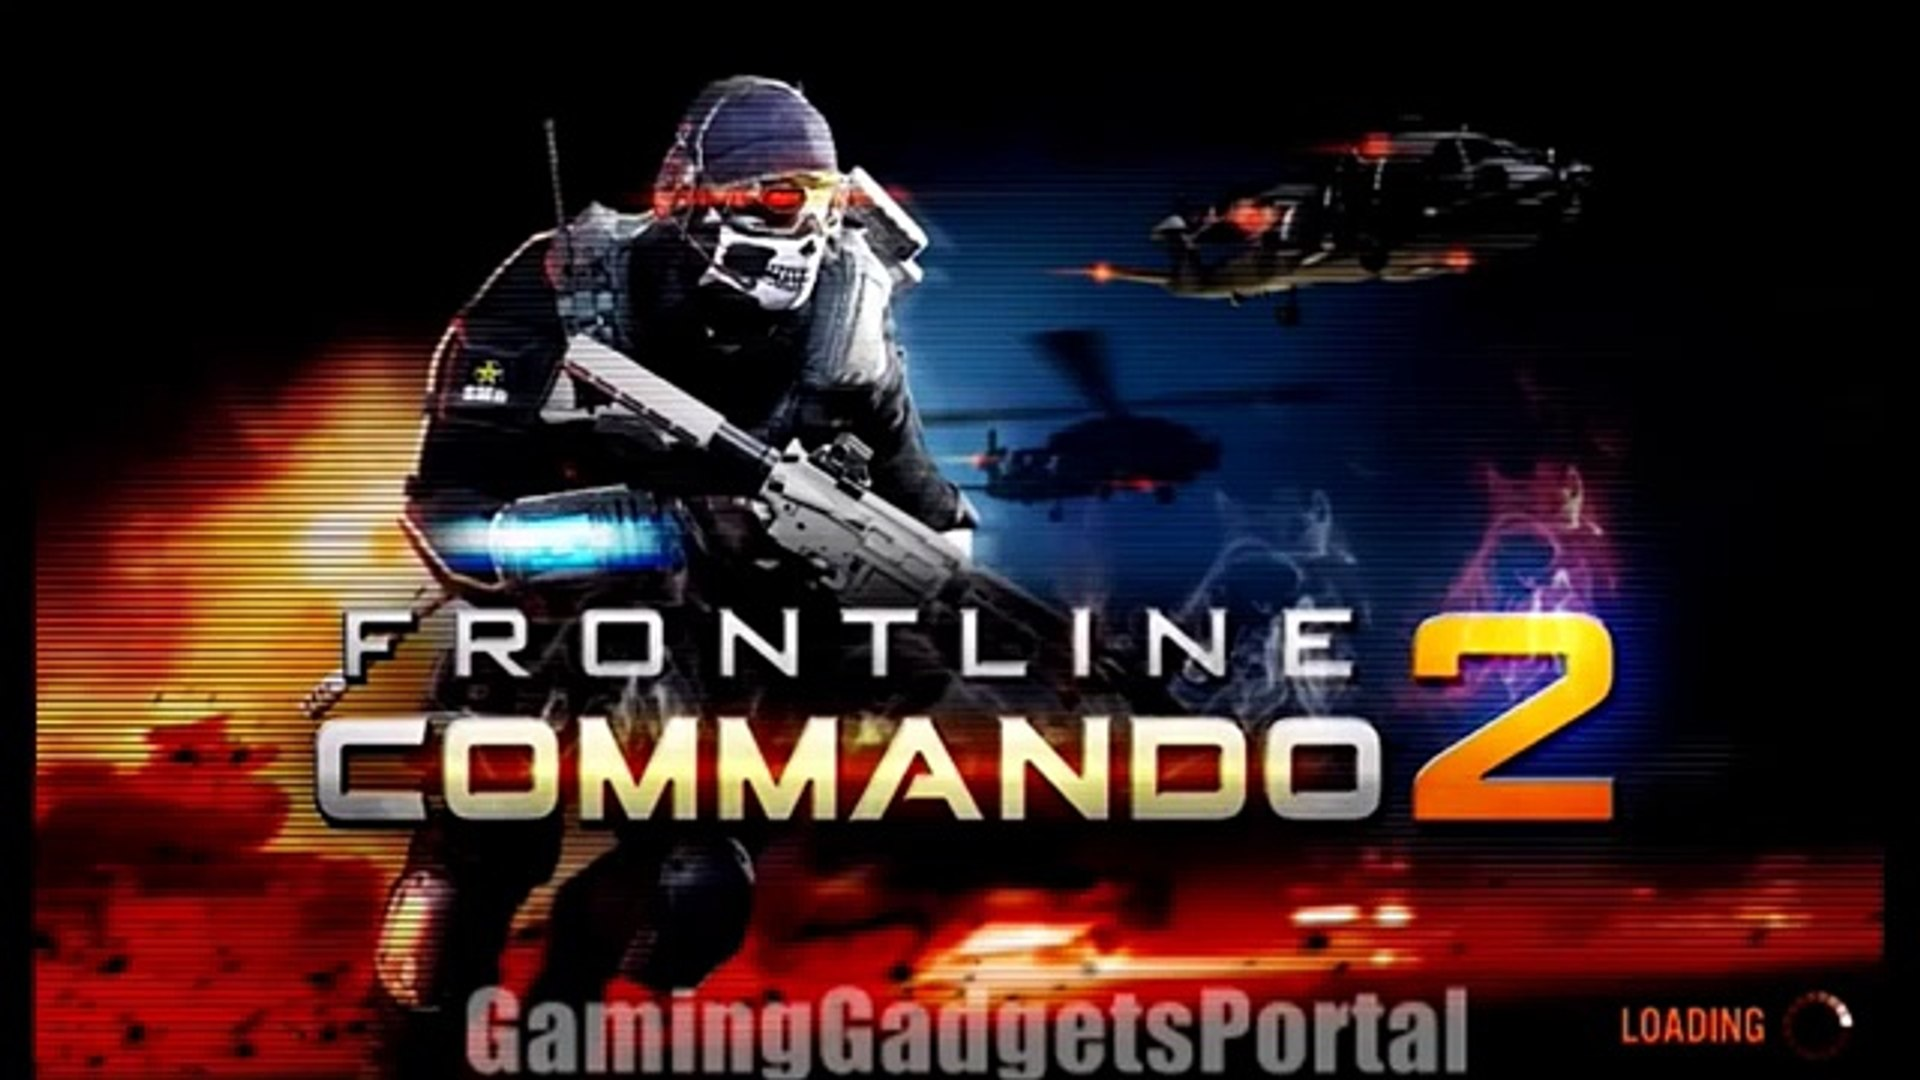 frontline commando apk and obb download